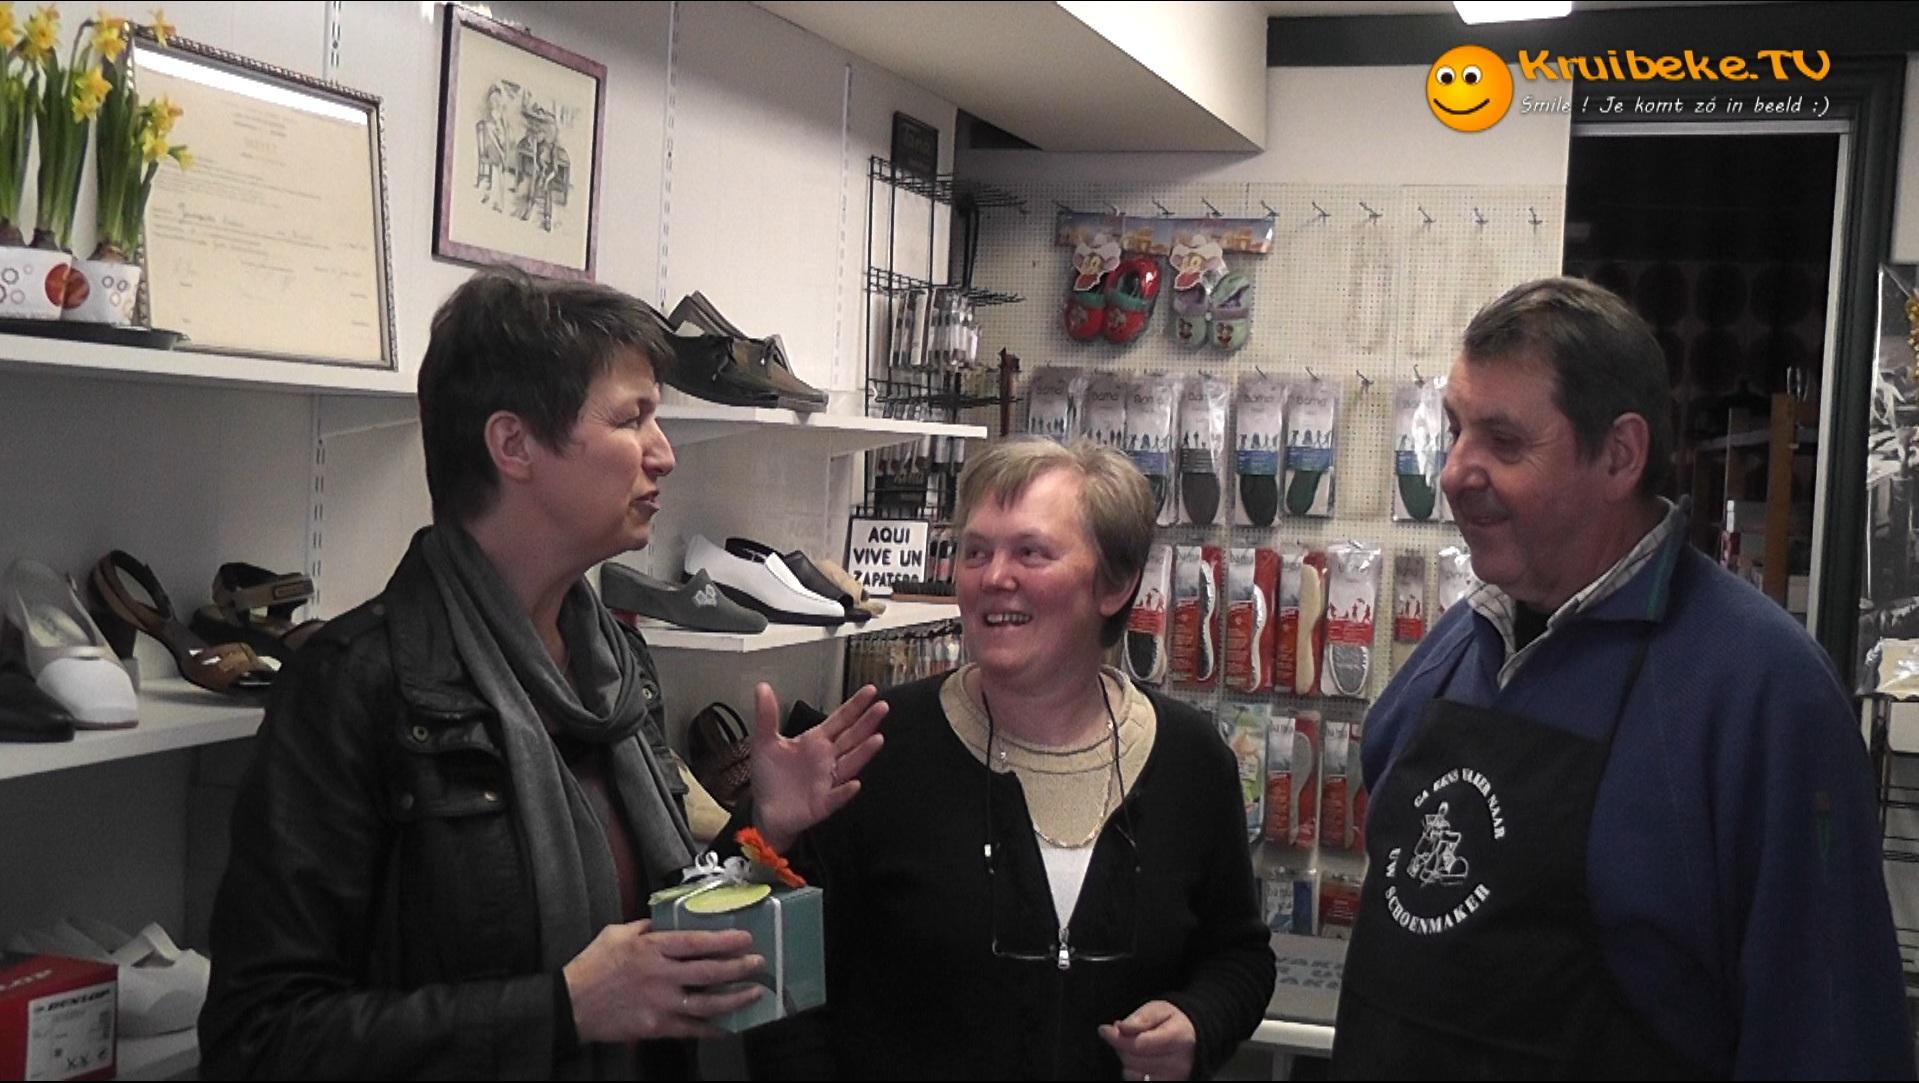 20120331 3 vrienden op pensioen in kruibeke Schoenmaker Andre Janssens